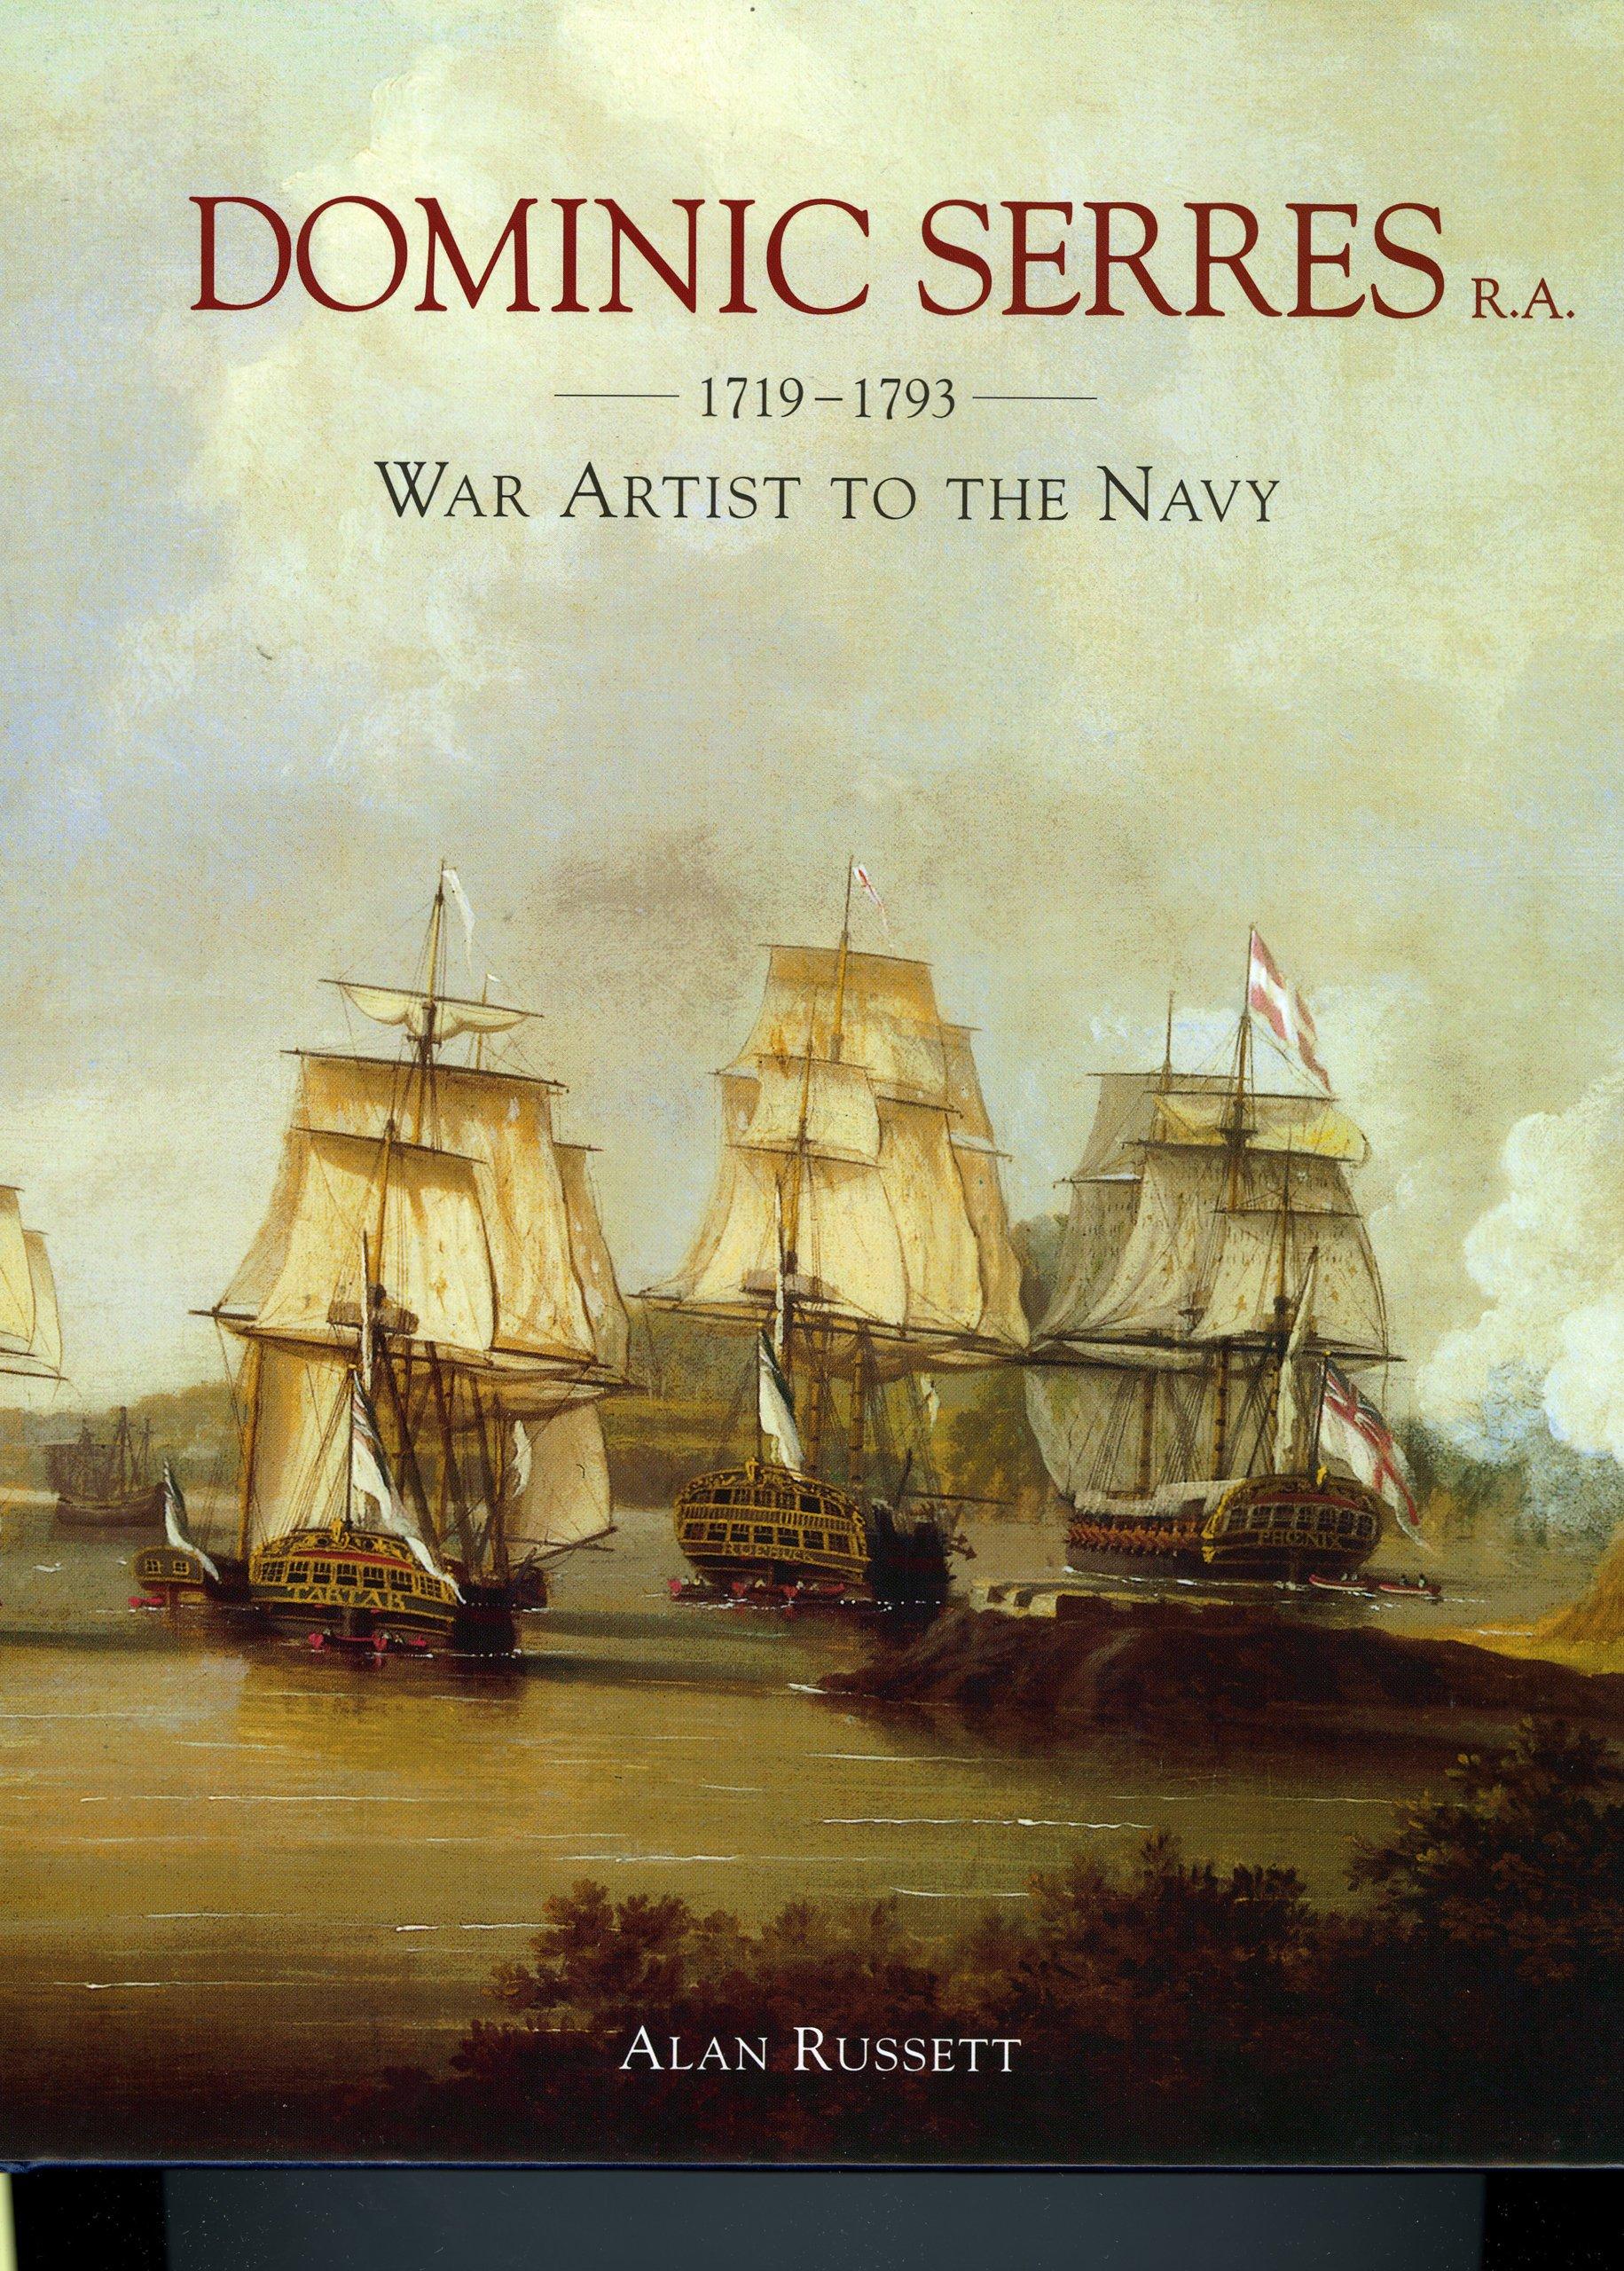 Dominic Serres R.A. 1719-1793: War Artist ot the Navy pdf